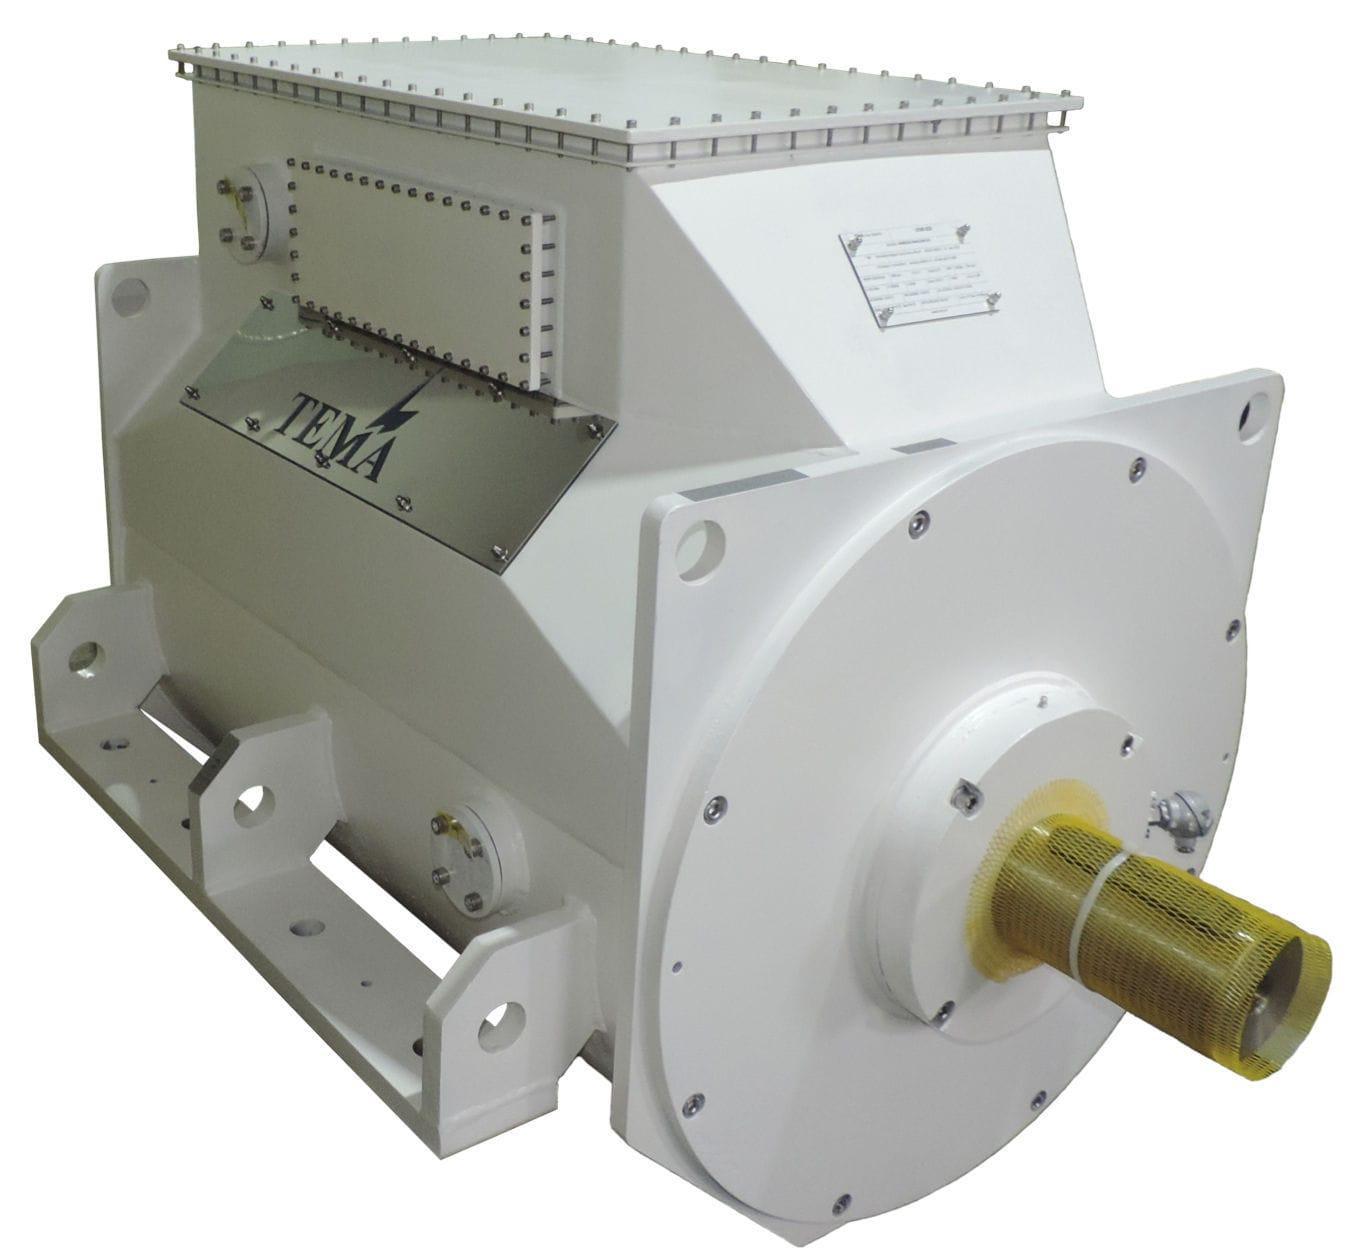 Ship engine / propulsion / electric / permanent magnet